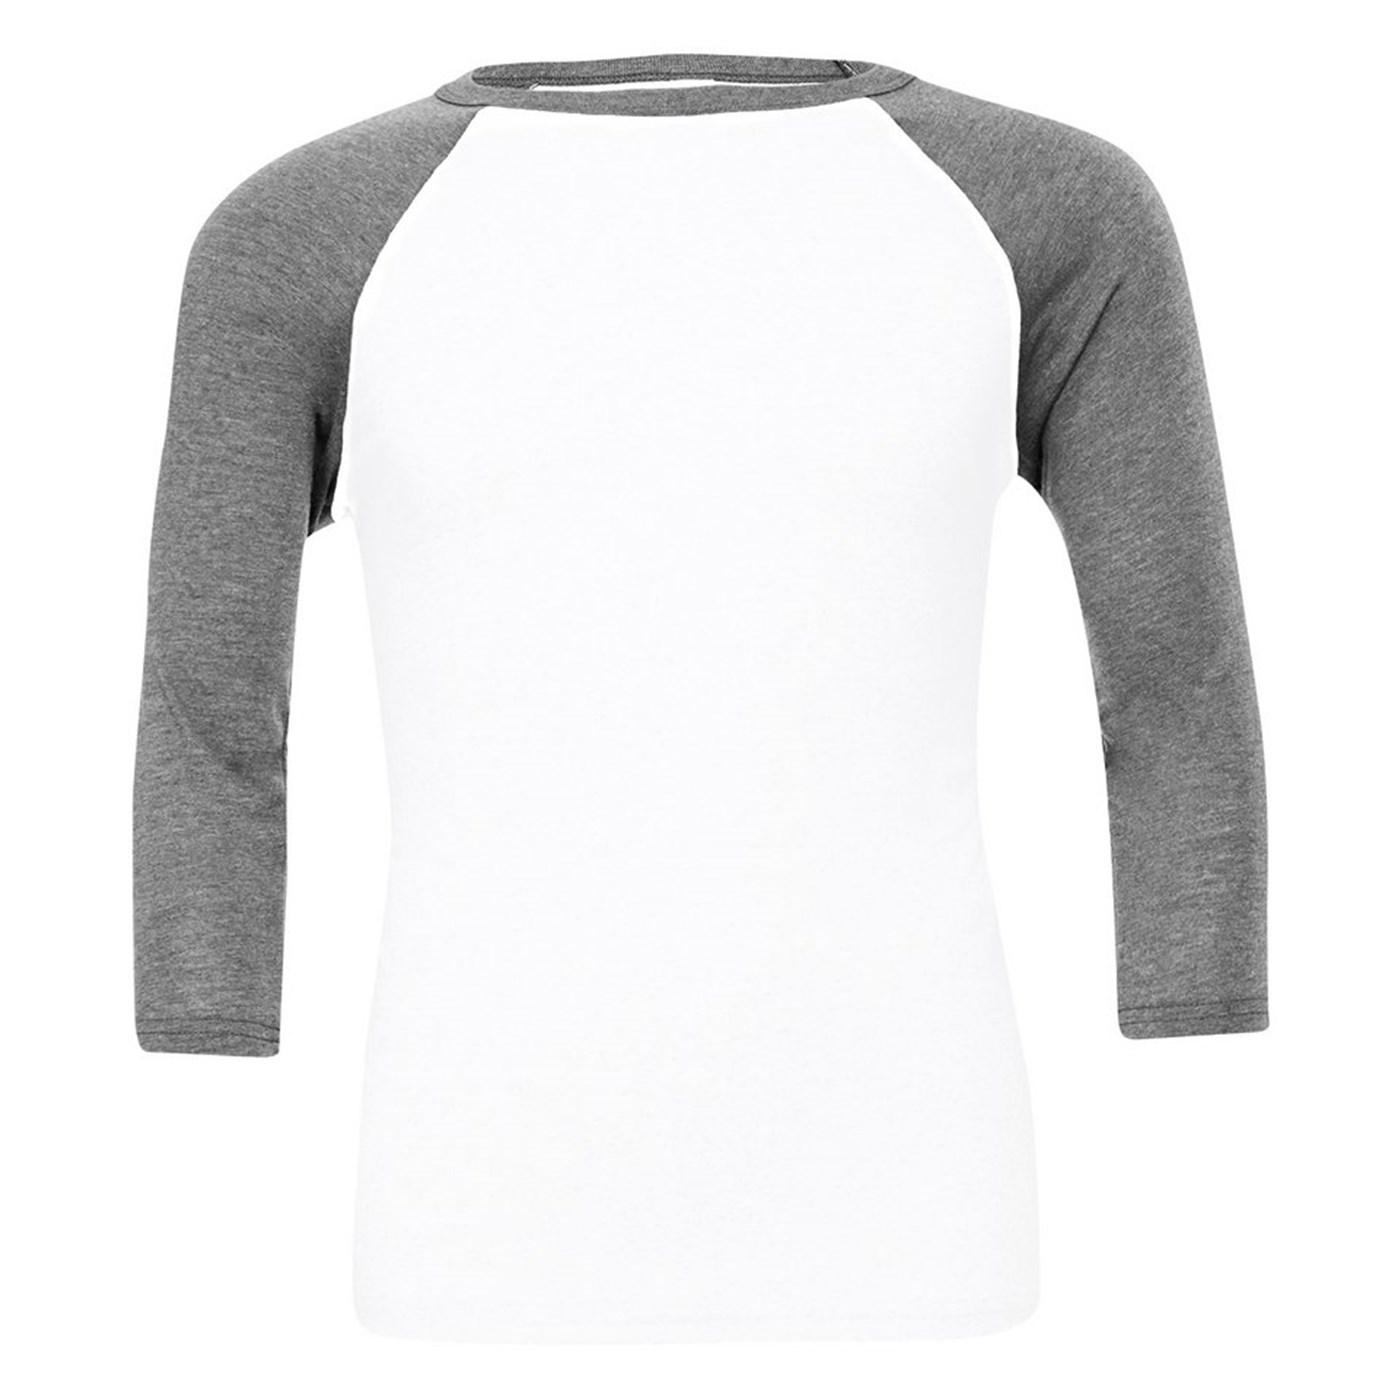 7d3581c0 Bella Canvas Adult's Triblend Raglan Sleeve Baseball T-Shirt BE100